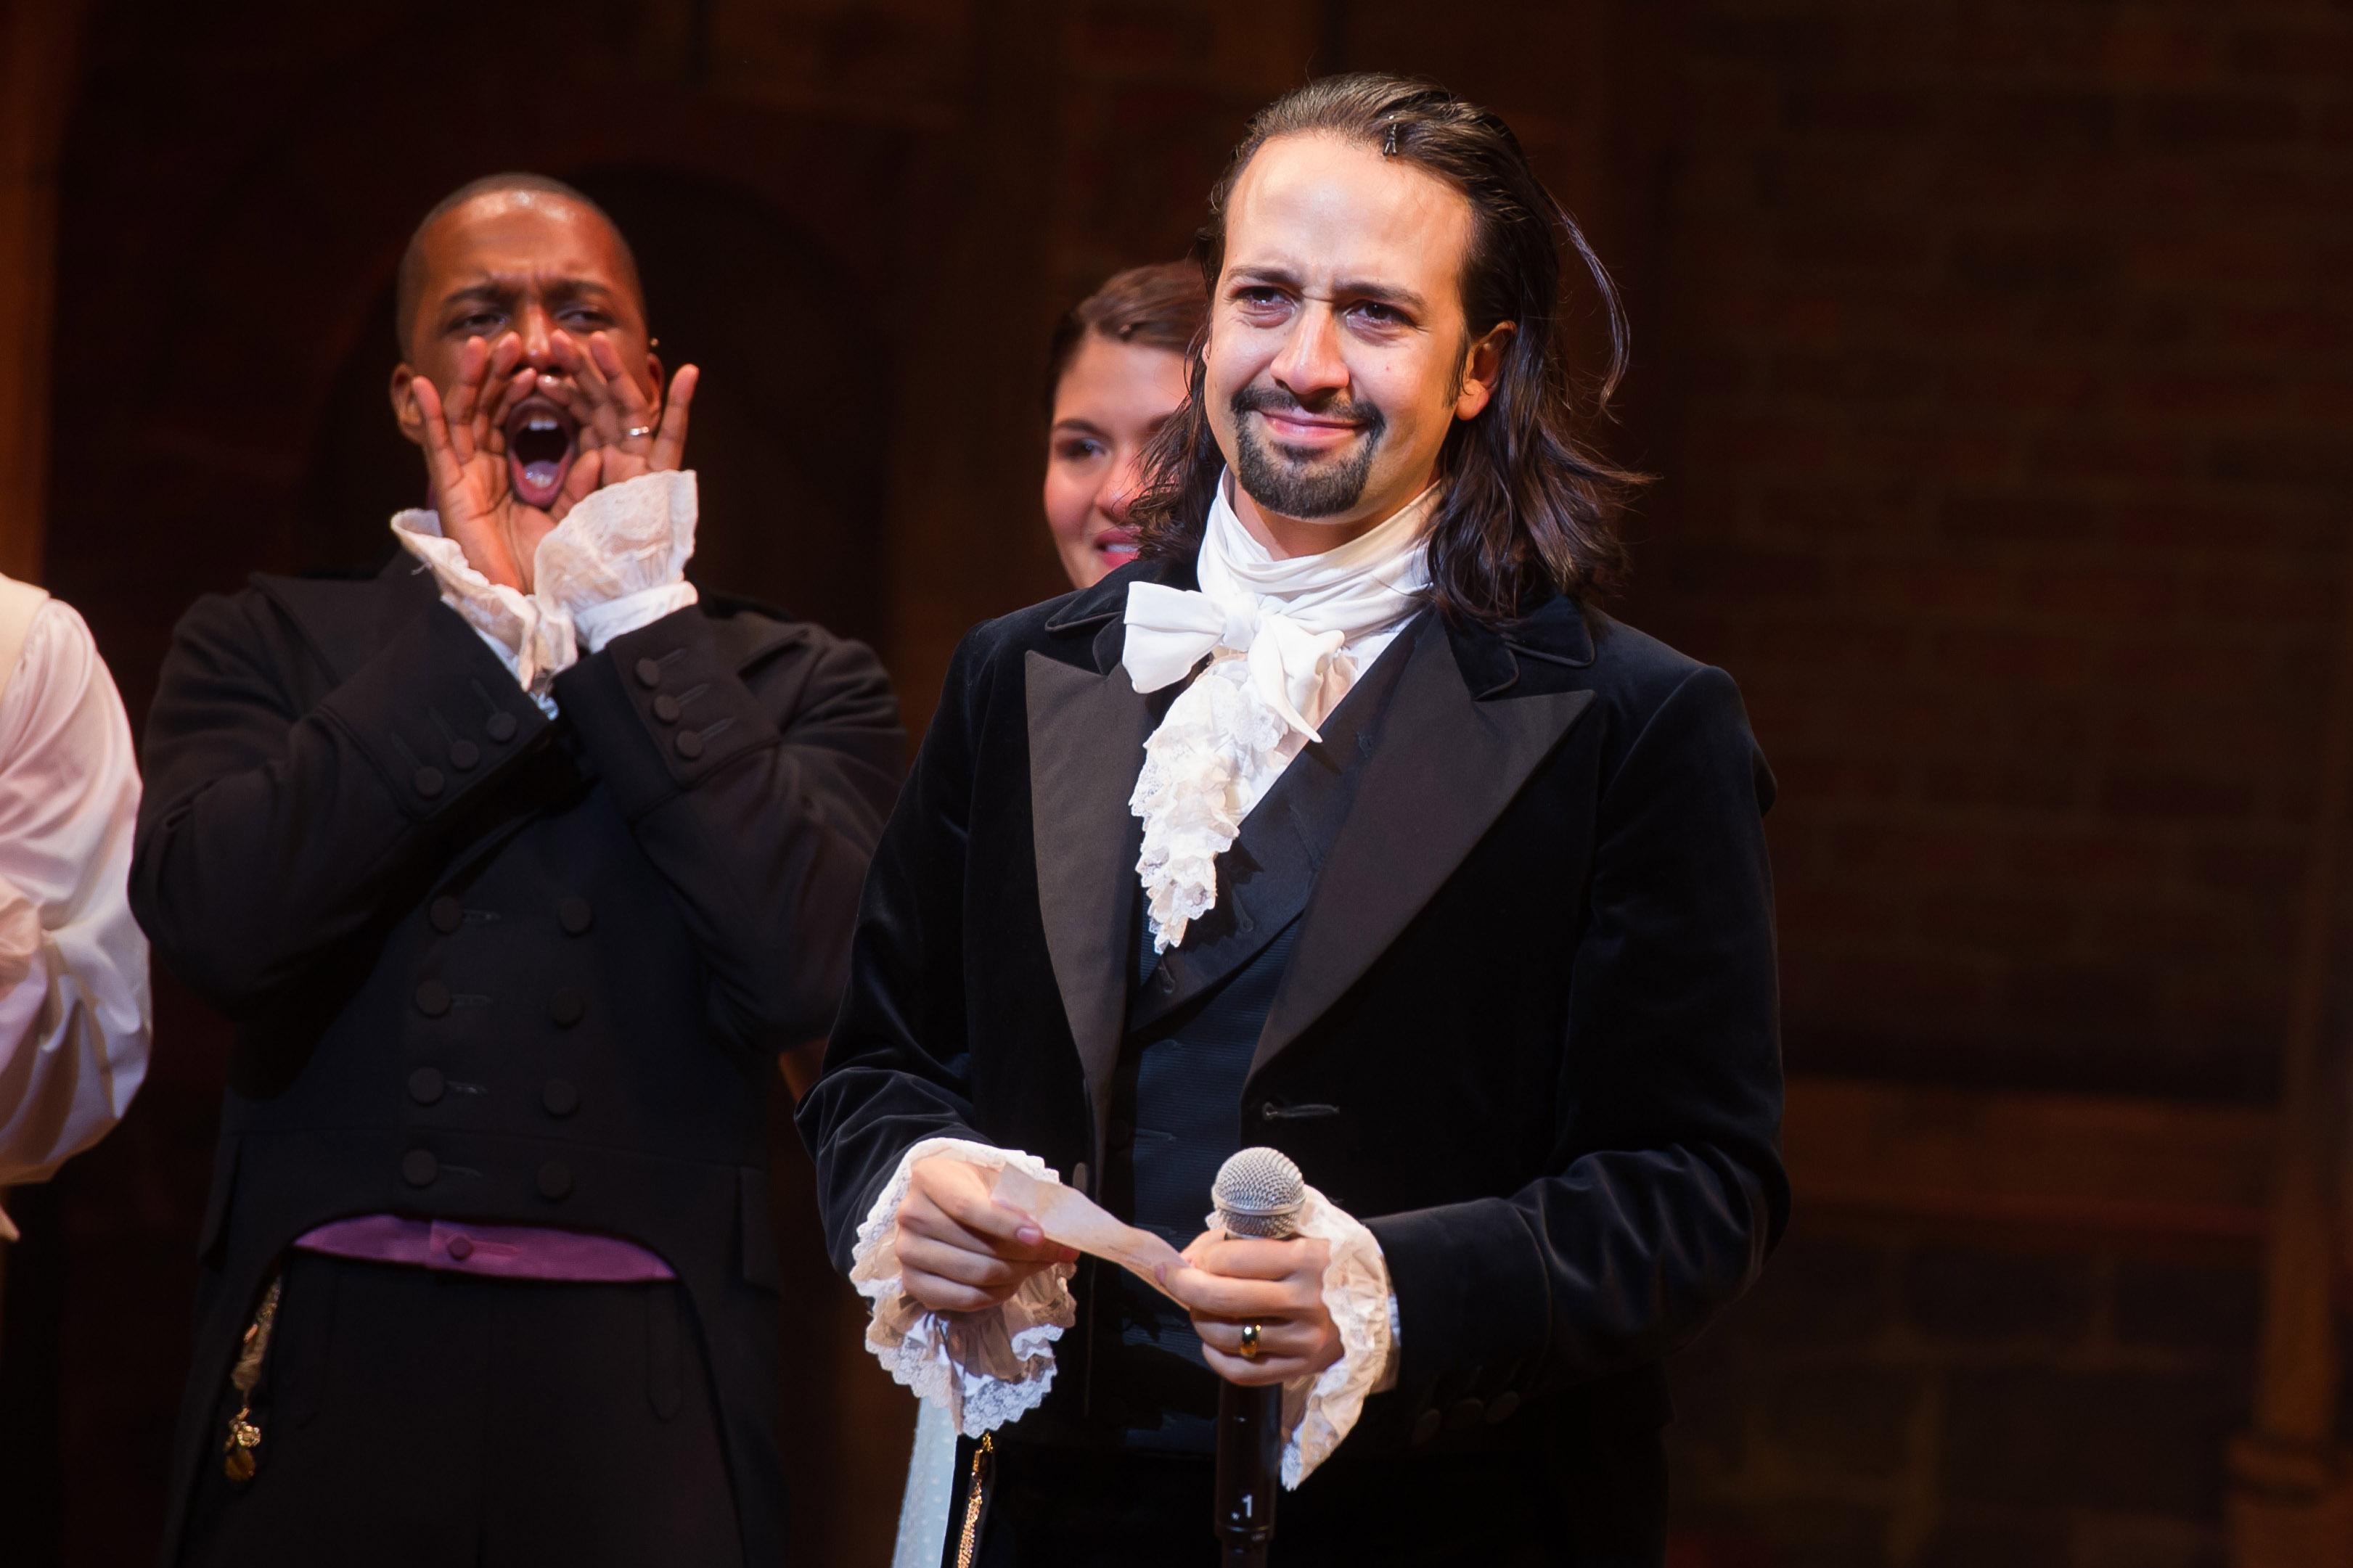 Lin-Manuel Miranda as Alexander Hamilton in Hamilton.